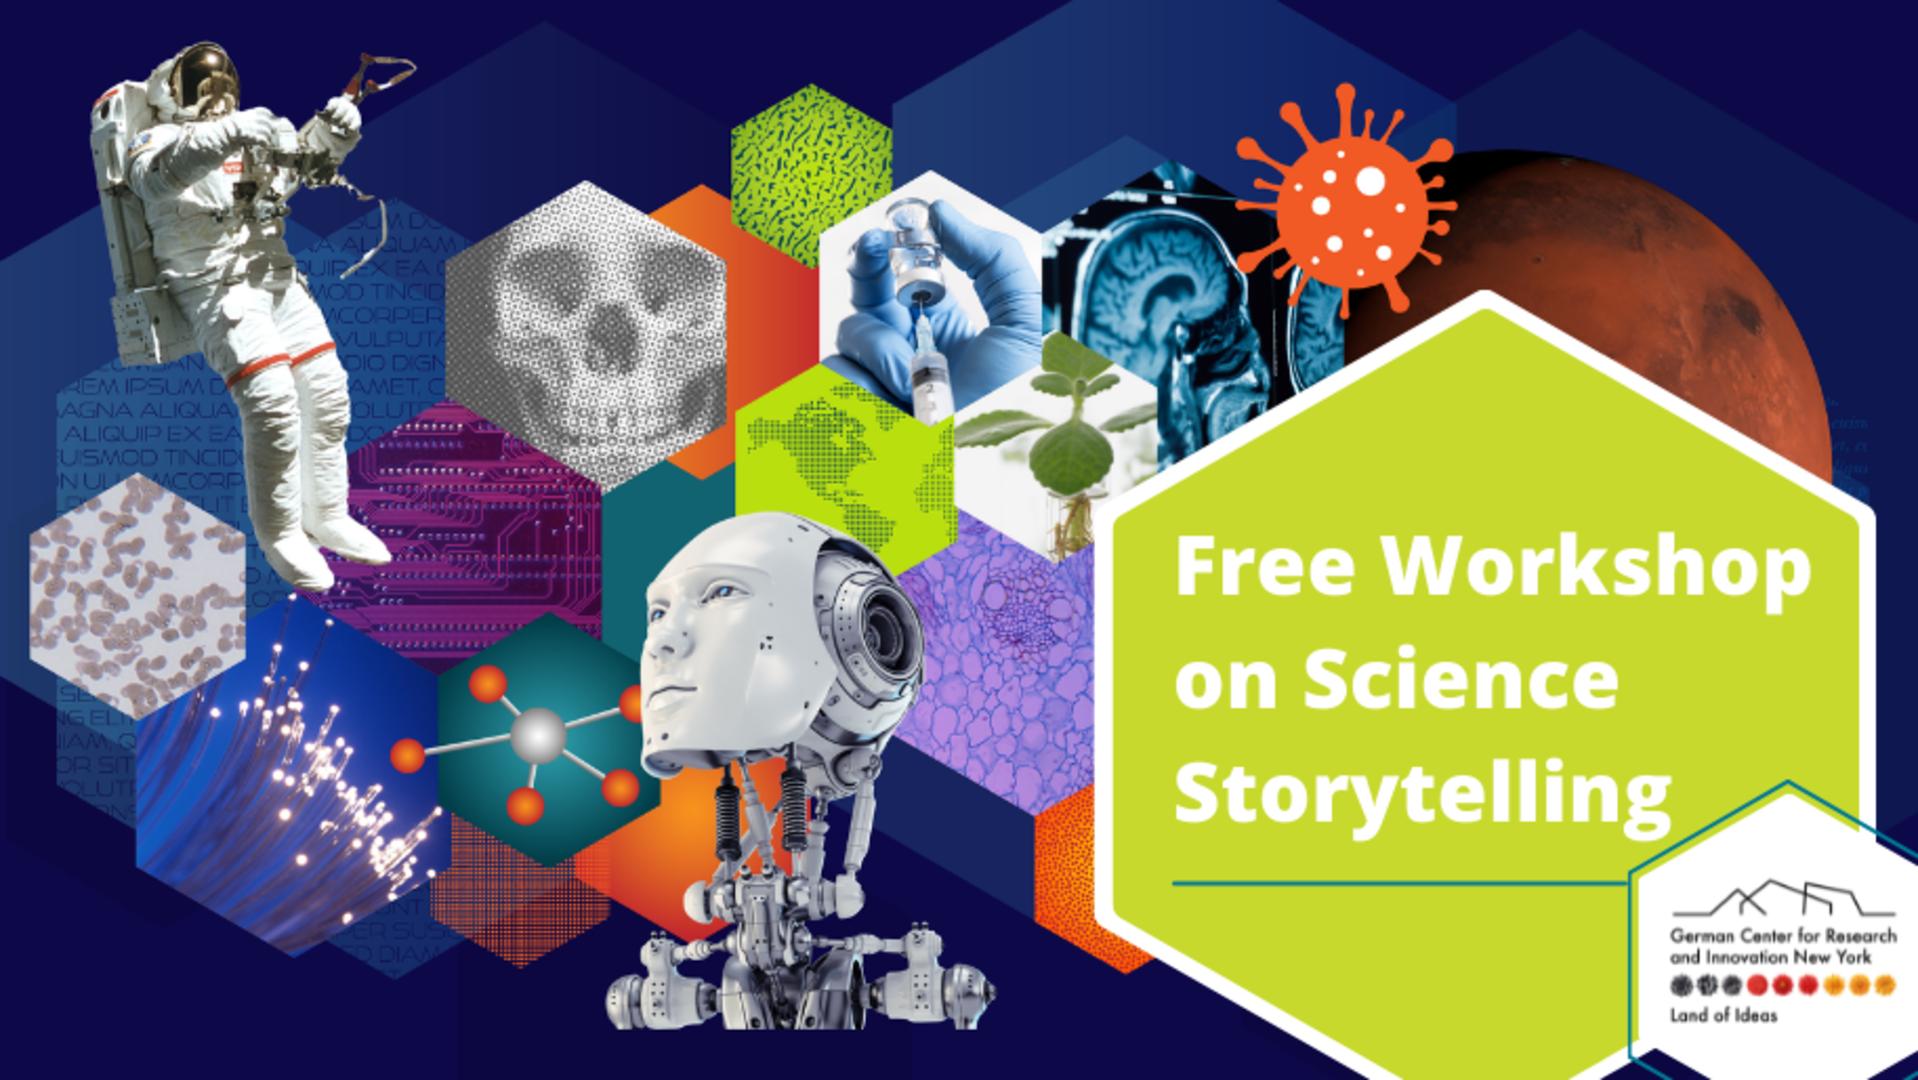 SCIENCE STORYTELLING WORKSHOP organizado por German Center for Research and Innovation (DWIH) New York